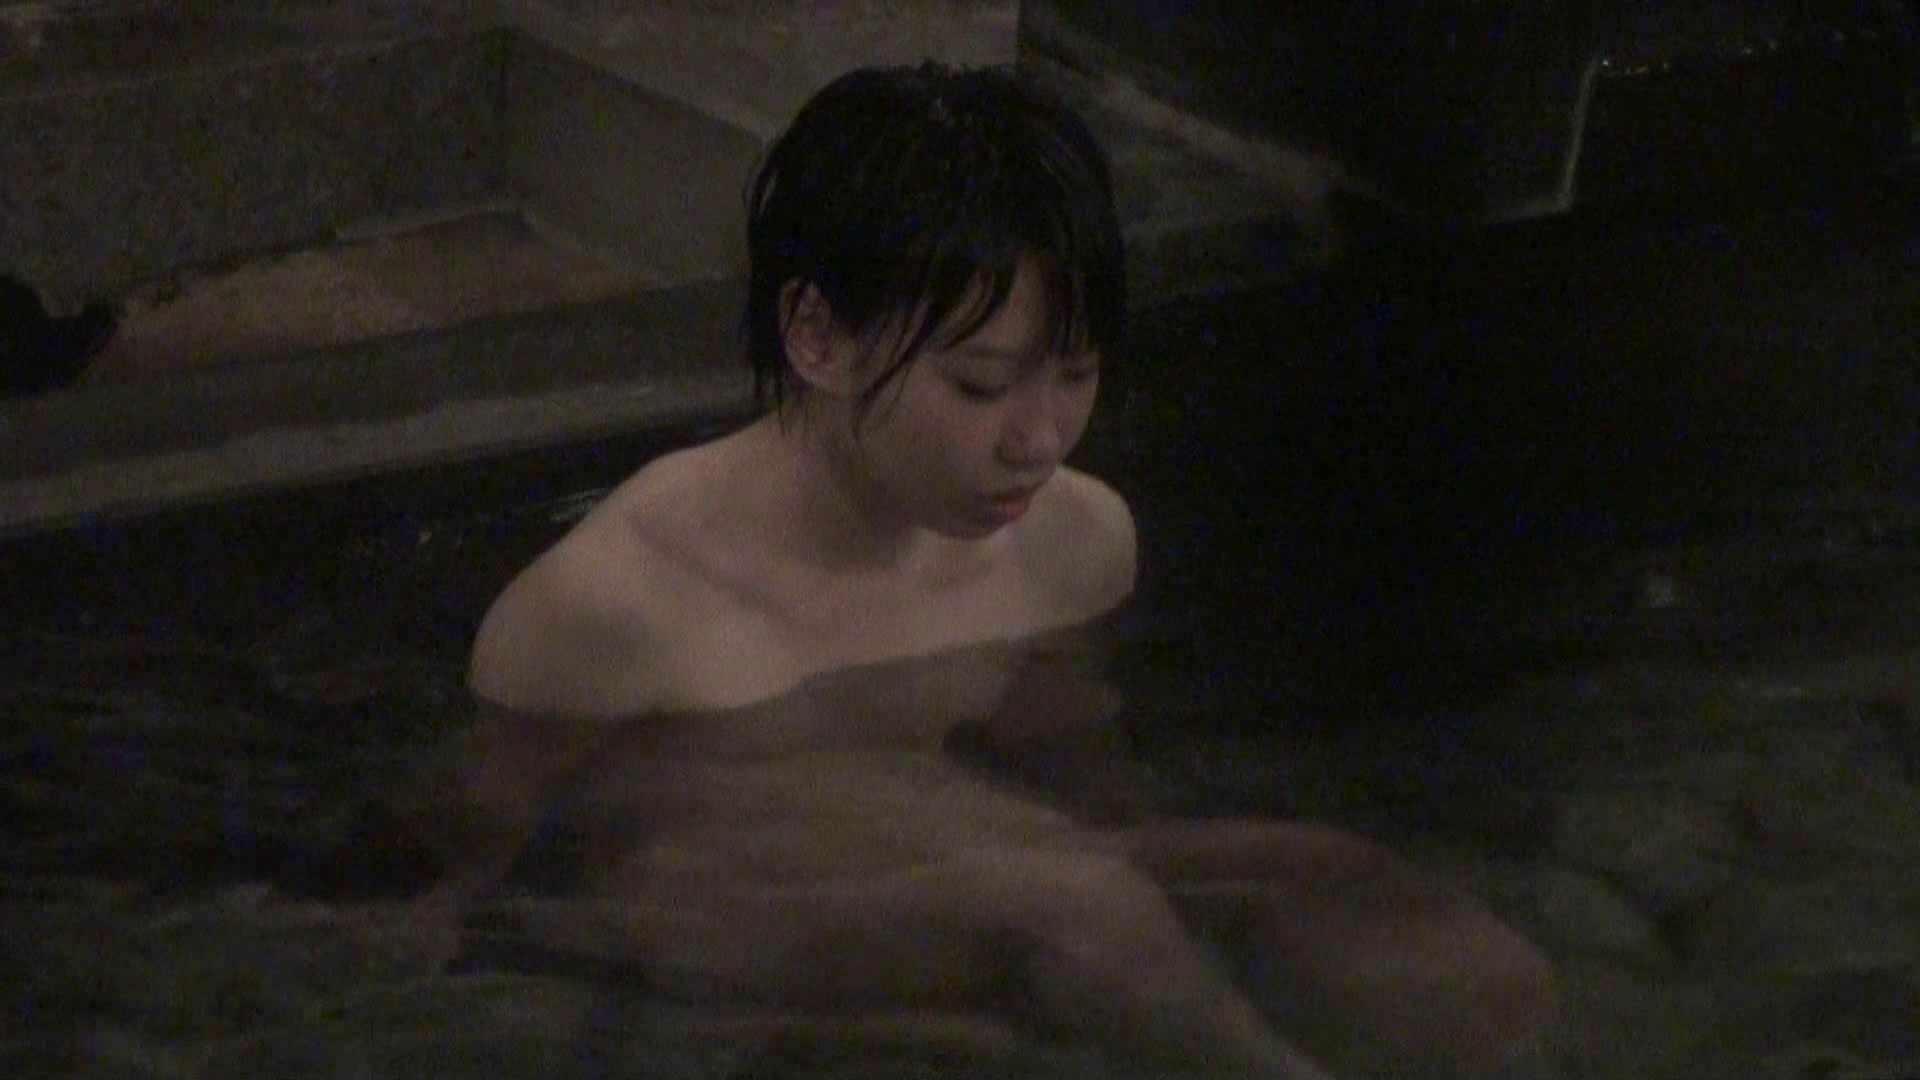 Aquaな露天風呂Vol.323 盗撮大放出 すけべAV動画紹介 69連発 2